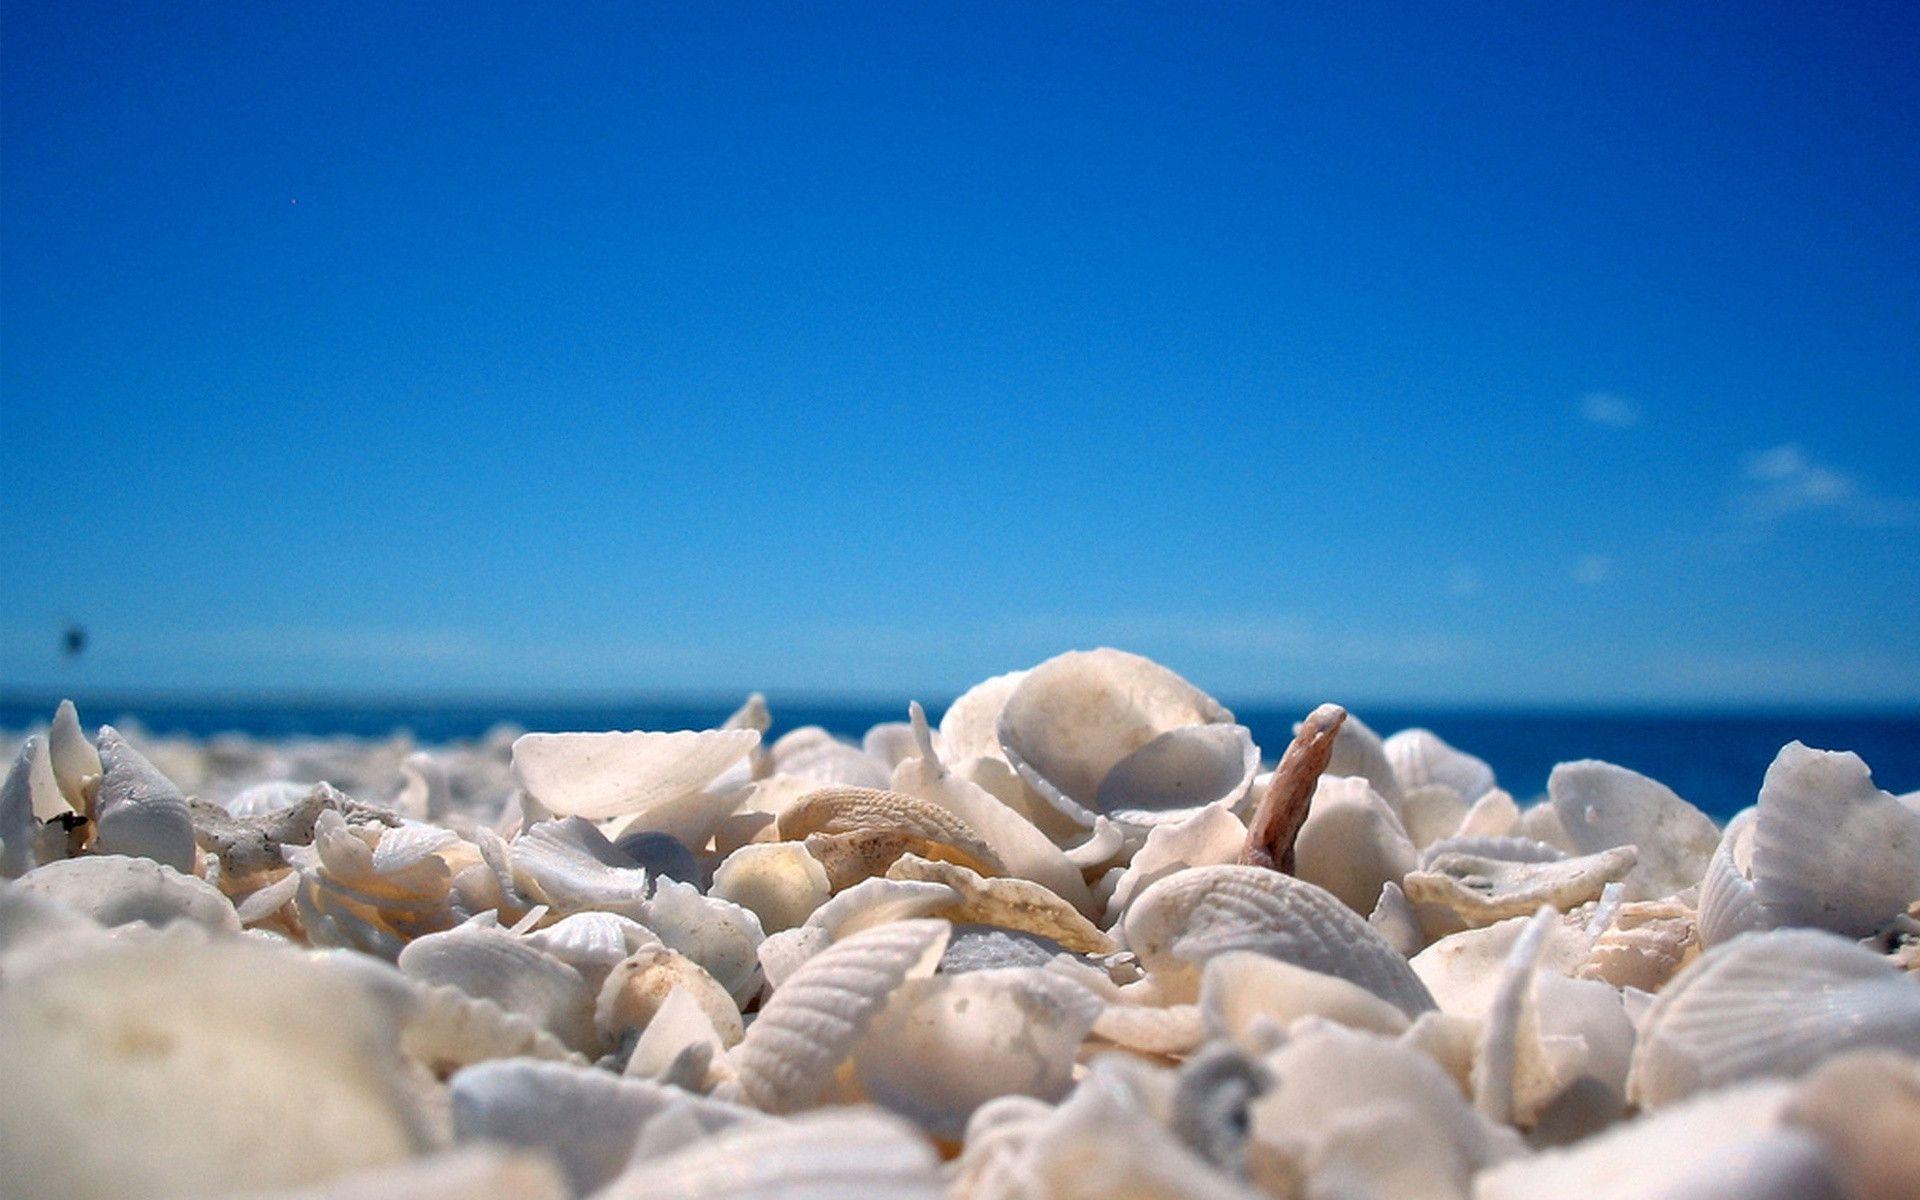 Seashells wallpaper 24 - Seashell Wallpapers Full Hd Wallpaper Search